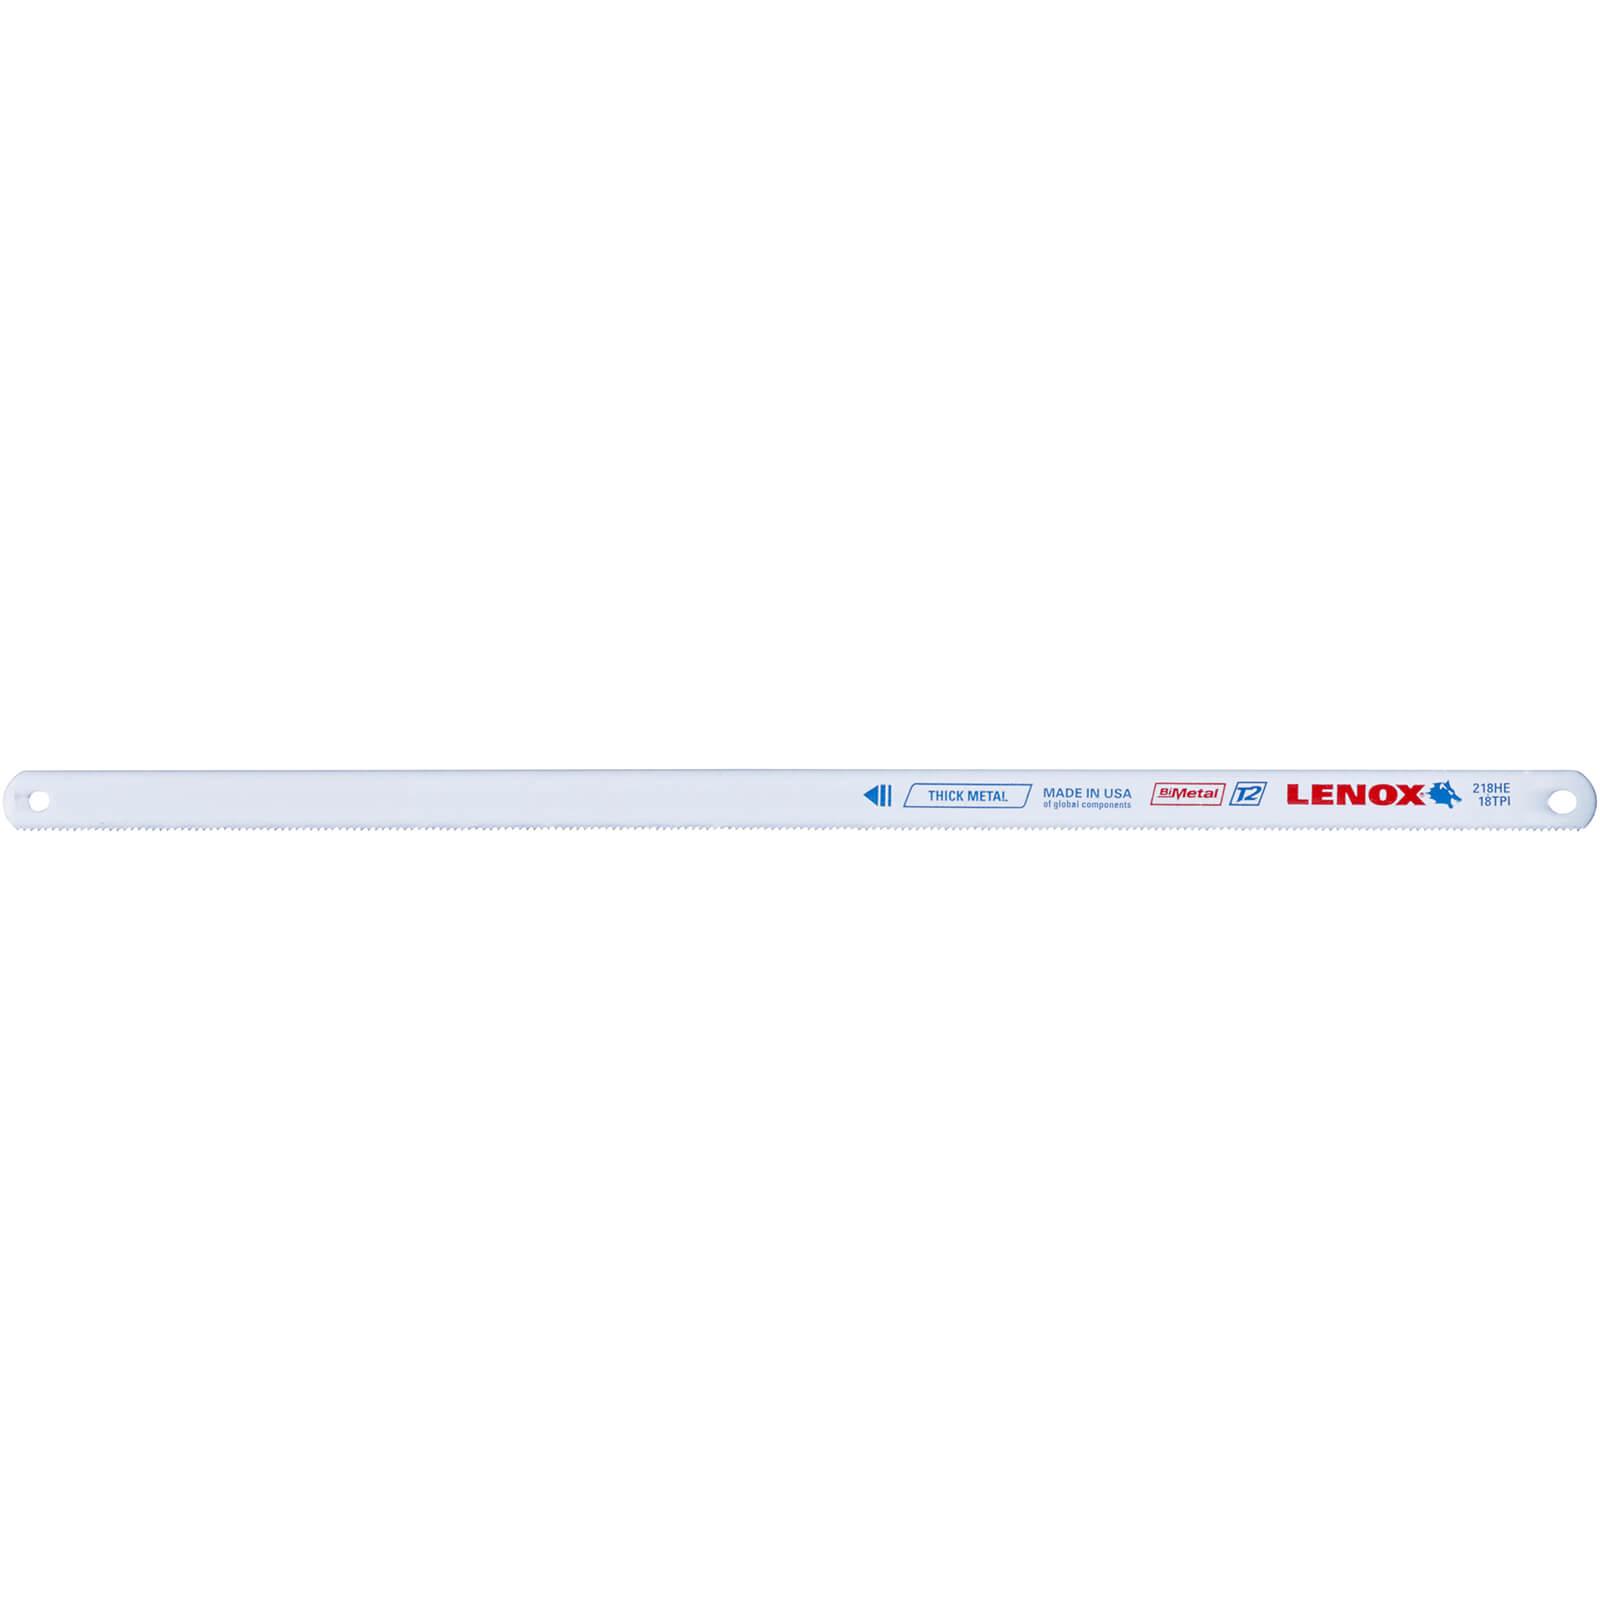 "Lenox Bi Metal Hacksaw Blades 12"" / 300mm 18tpi Pack of 100"